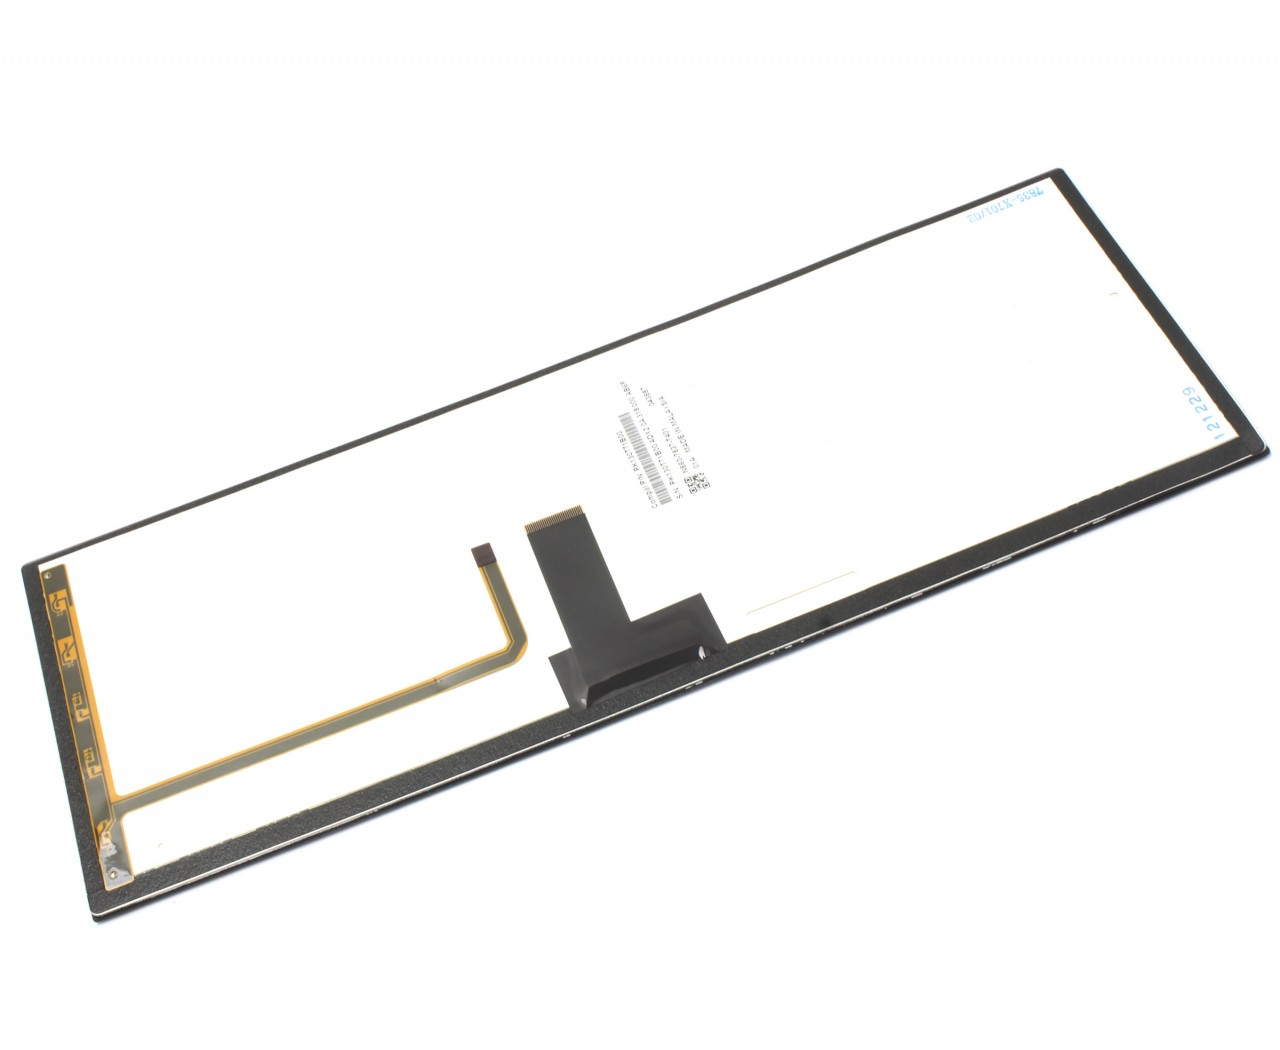 Tastatura Toshiba N860 7835 T002 Rama albastra iluminata backlit imagine powerlaptop.ro 2021